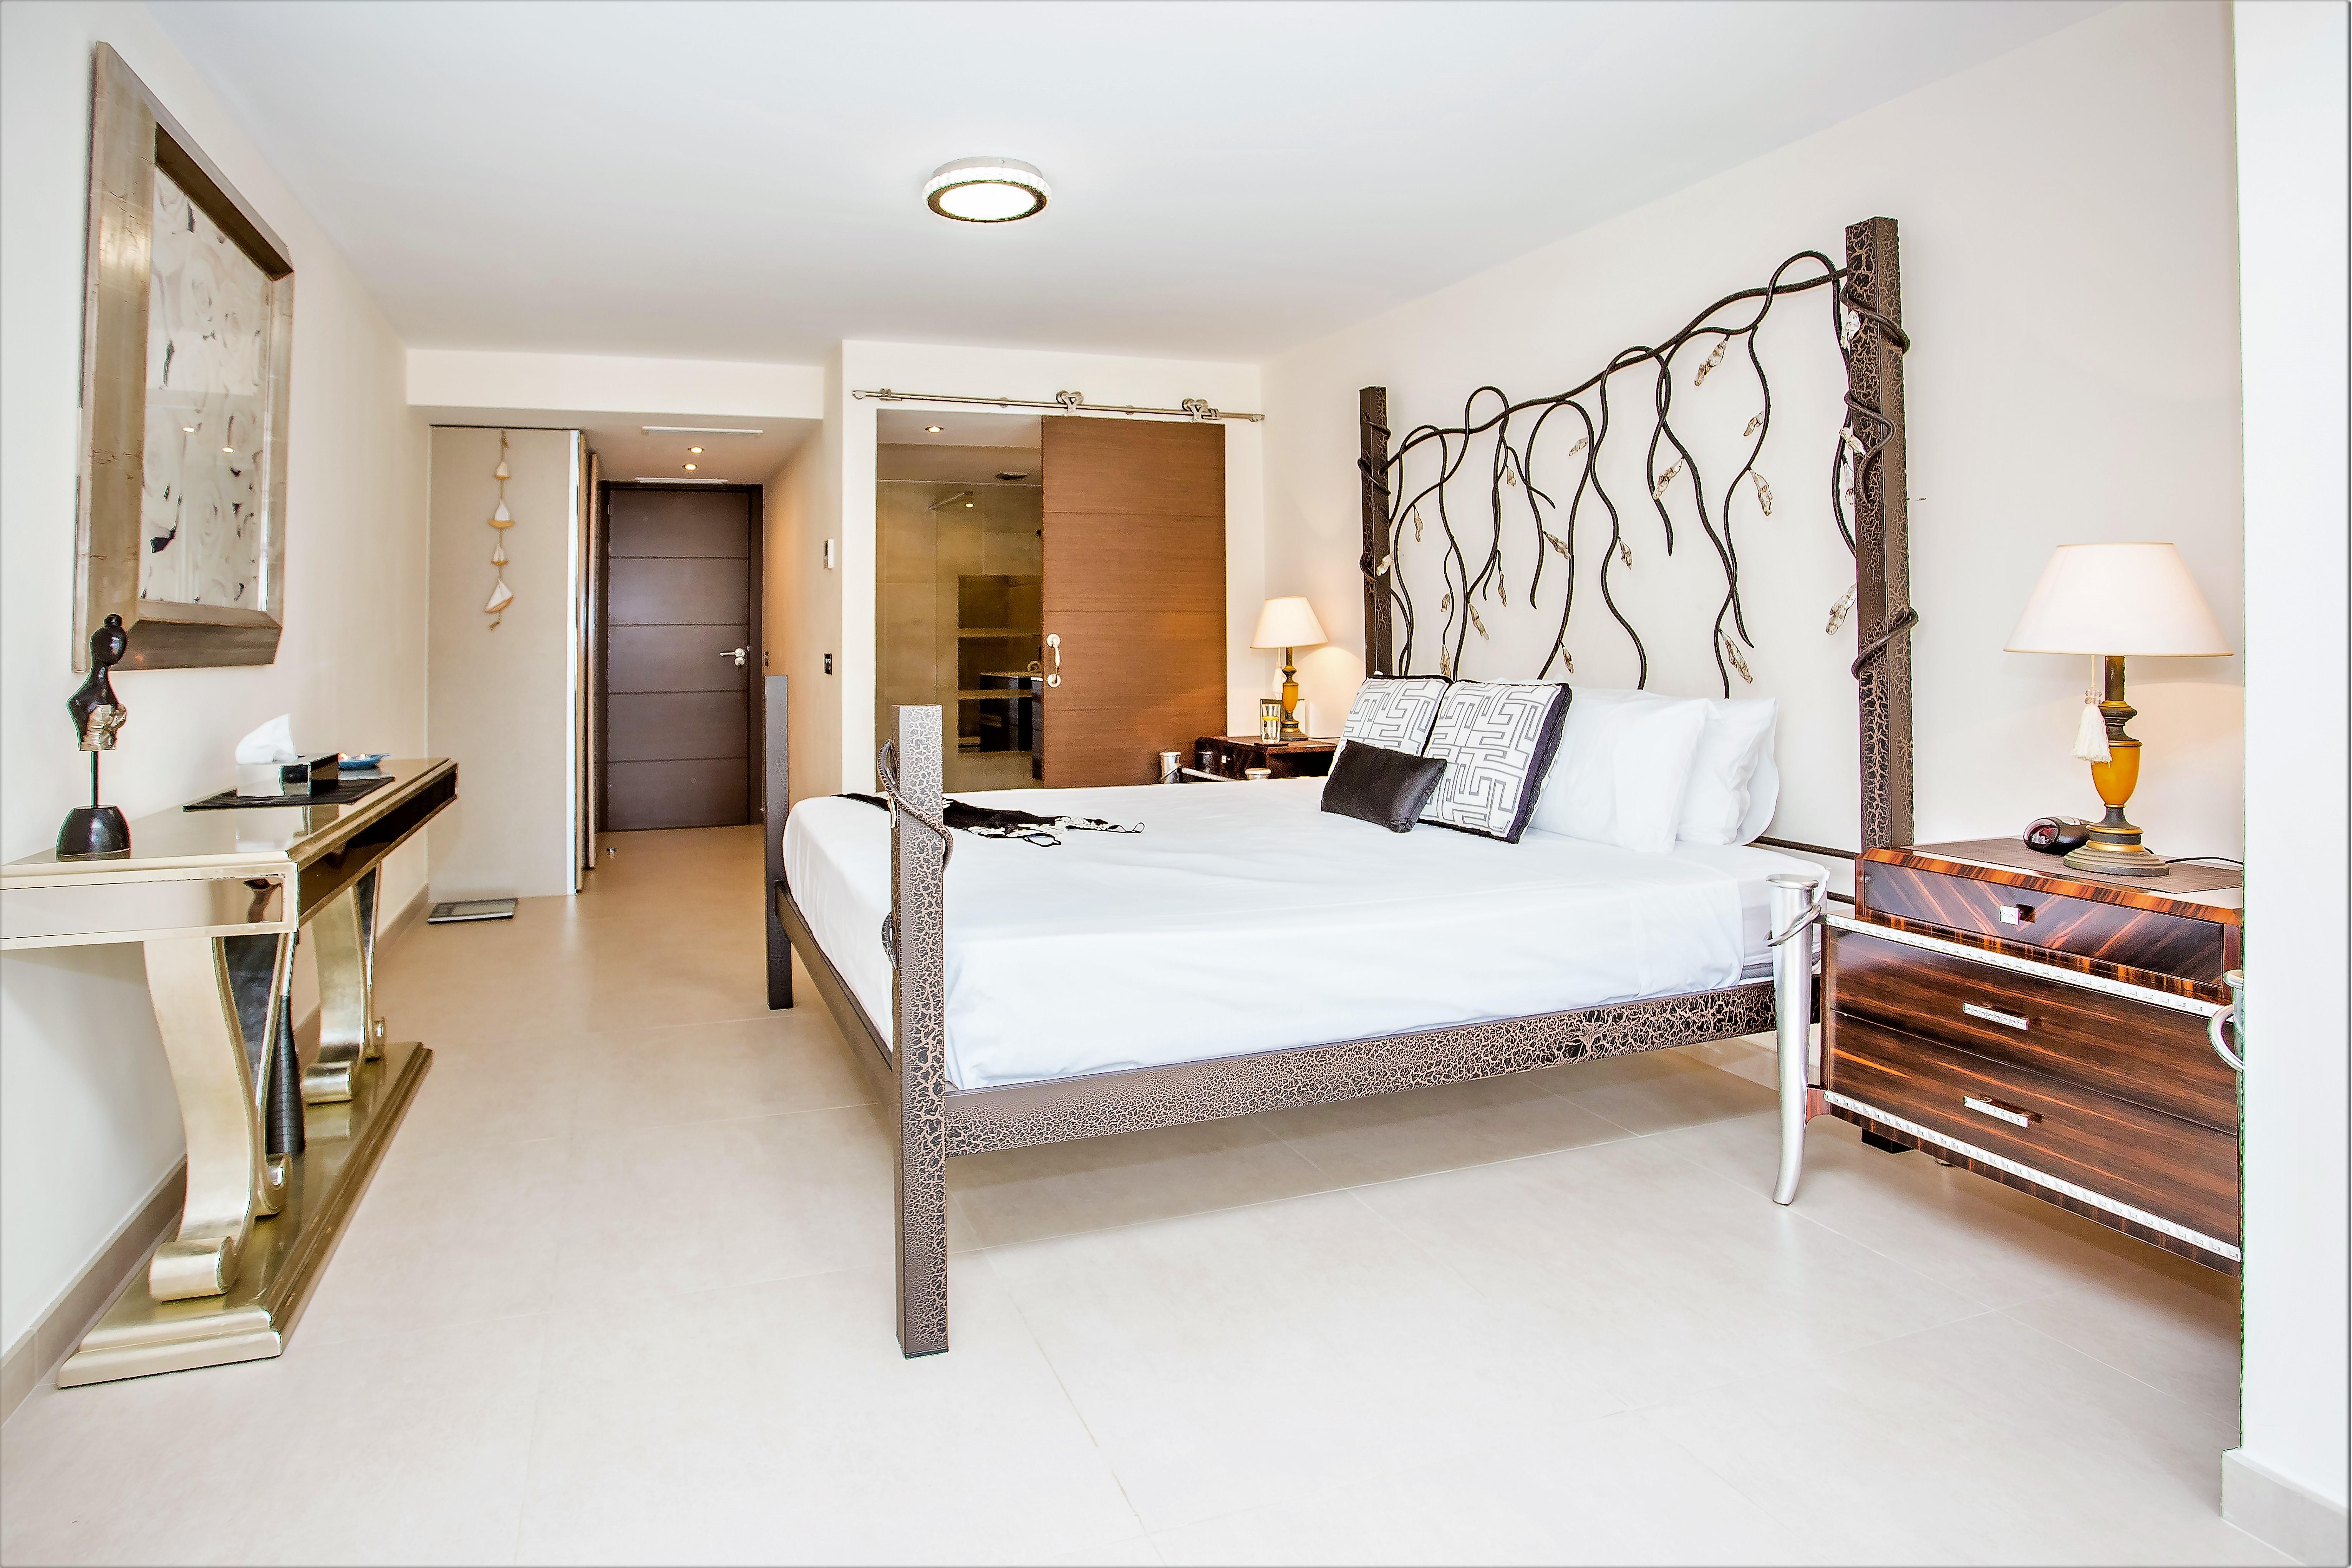 Apartment 8 Bedroom VILLA BY PUERTO BANUS   SEA 5 min                                photo 16956476